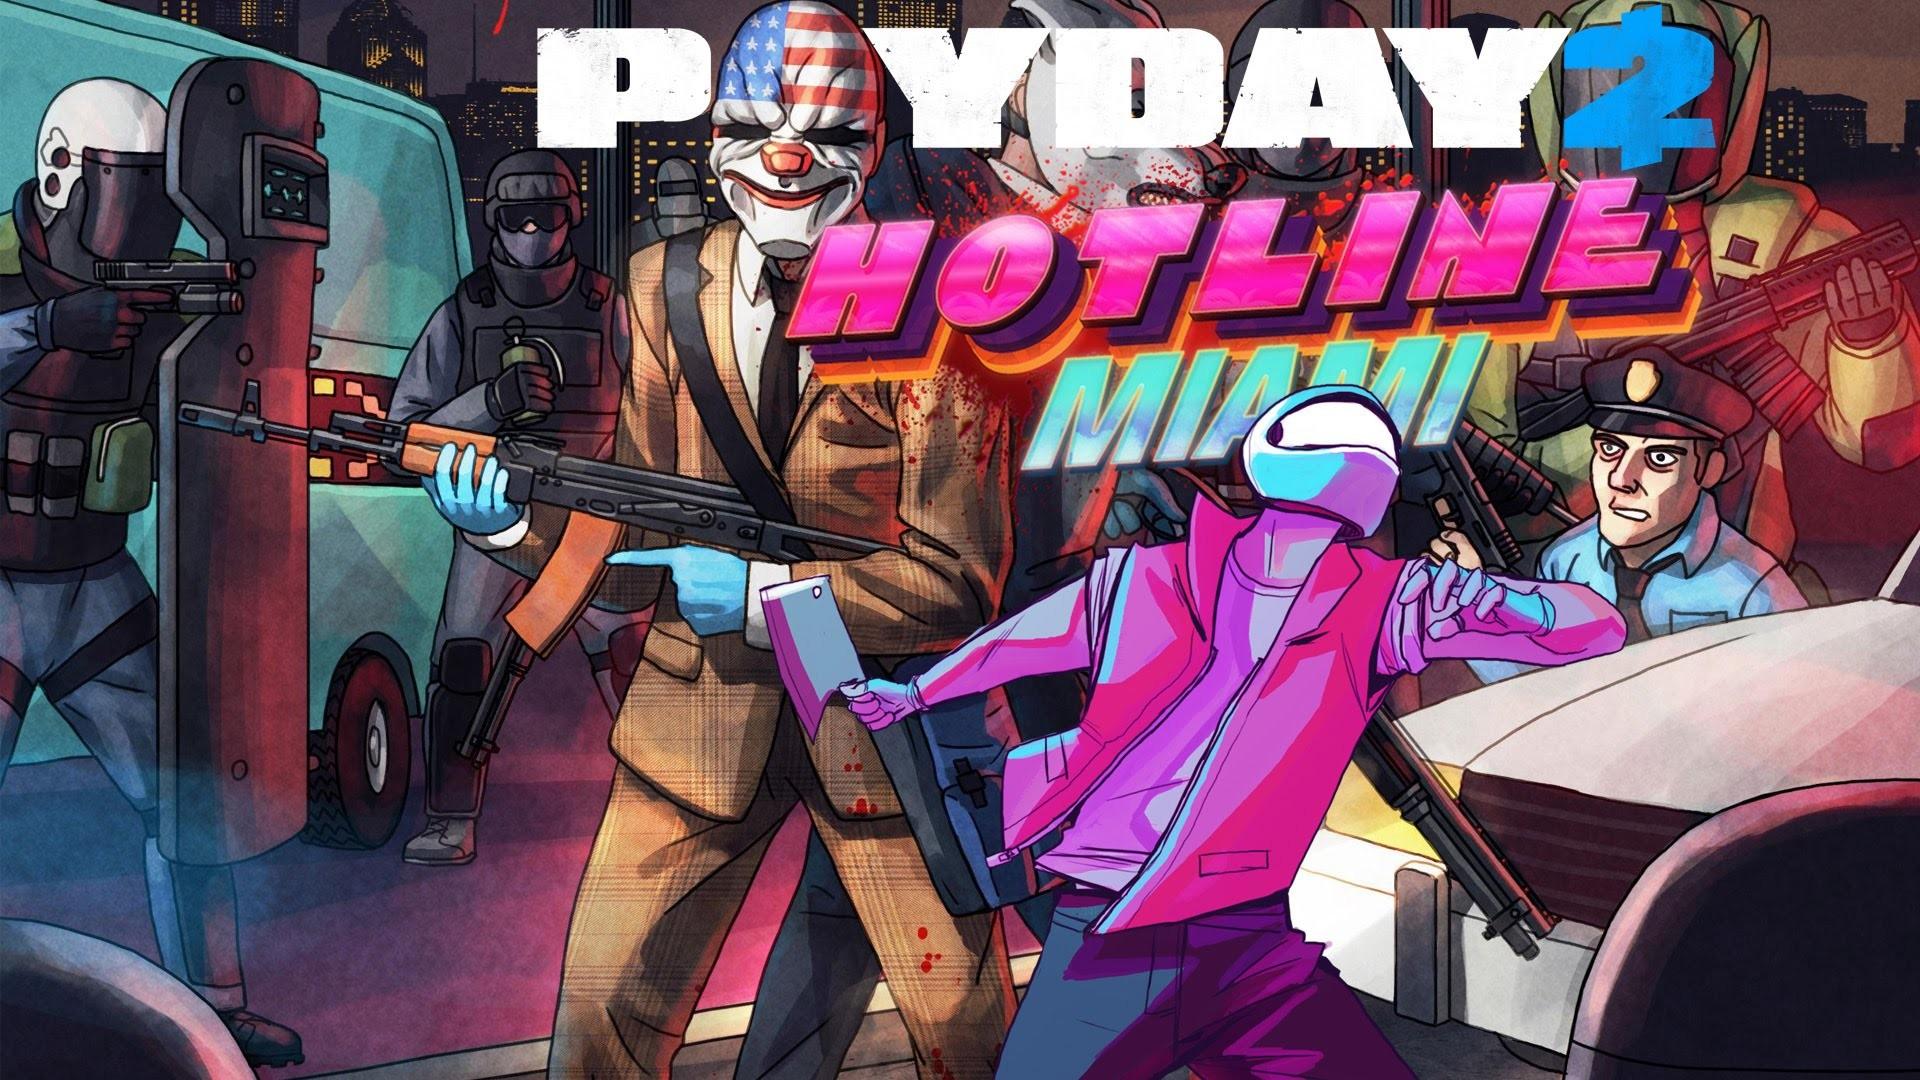 XT Mood Play: Payday 2 – Hotline Miami DLC – The Full Hei$t [1080p] –  YouTube